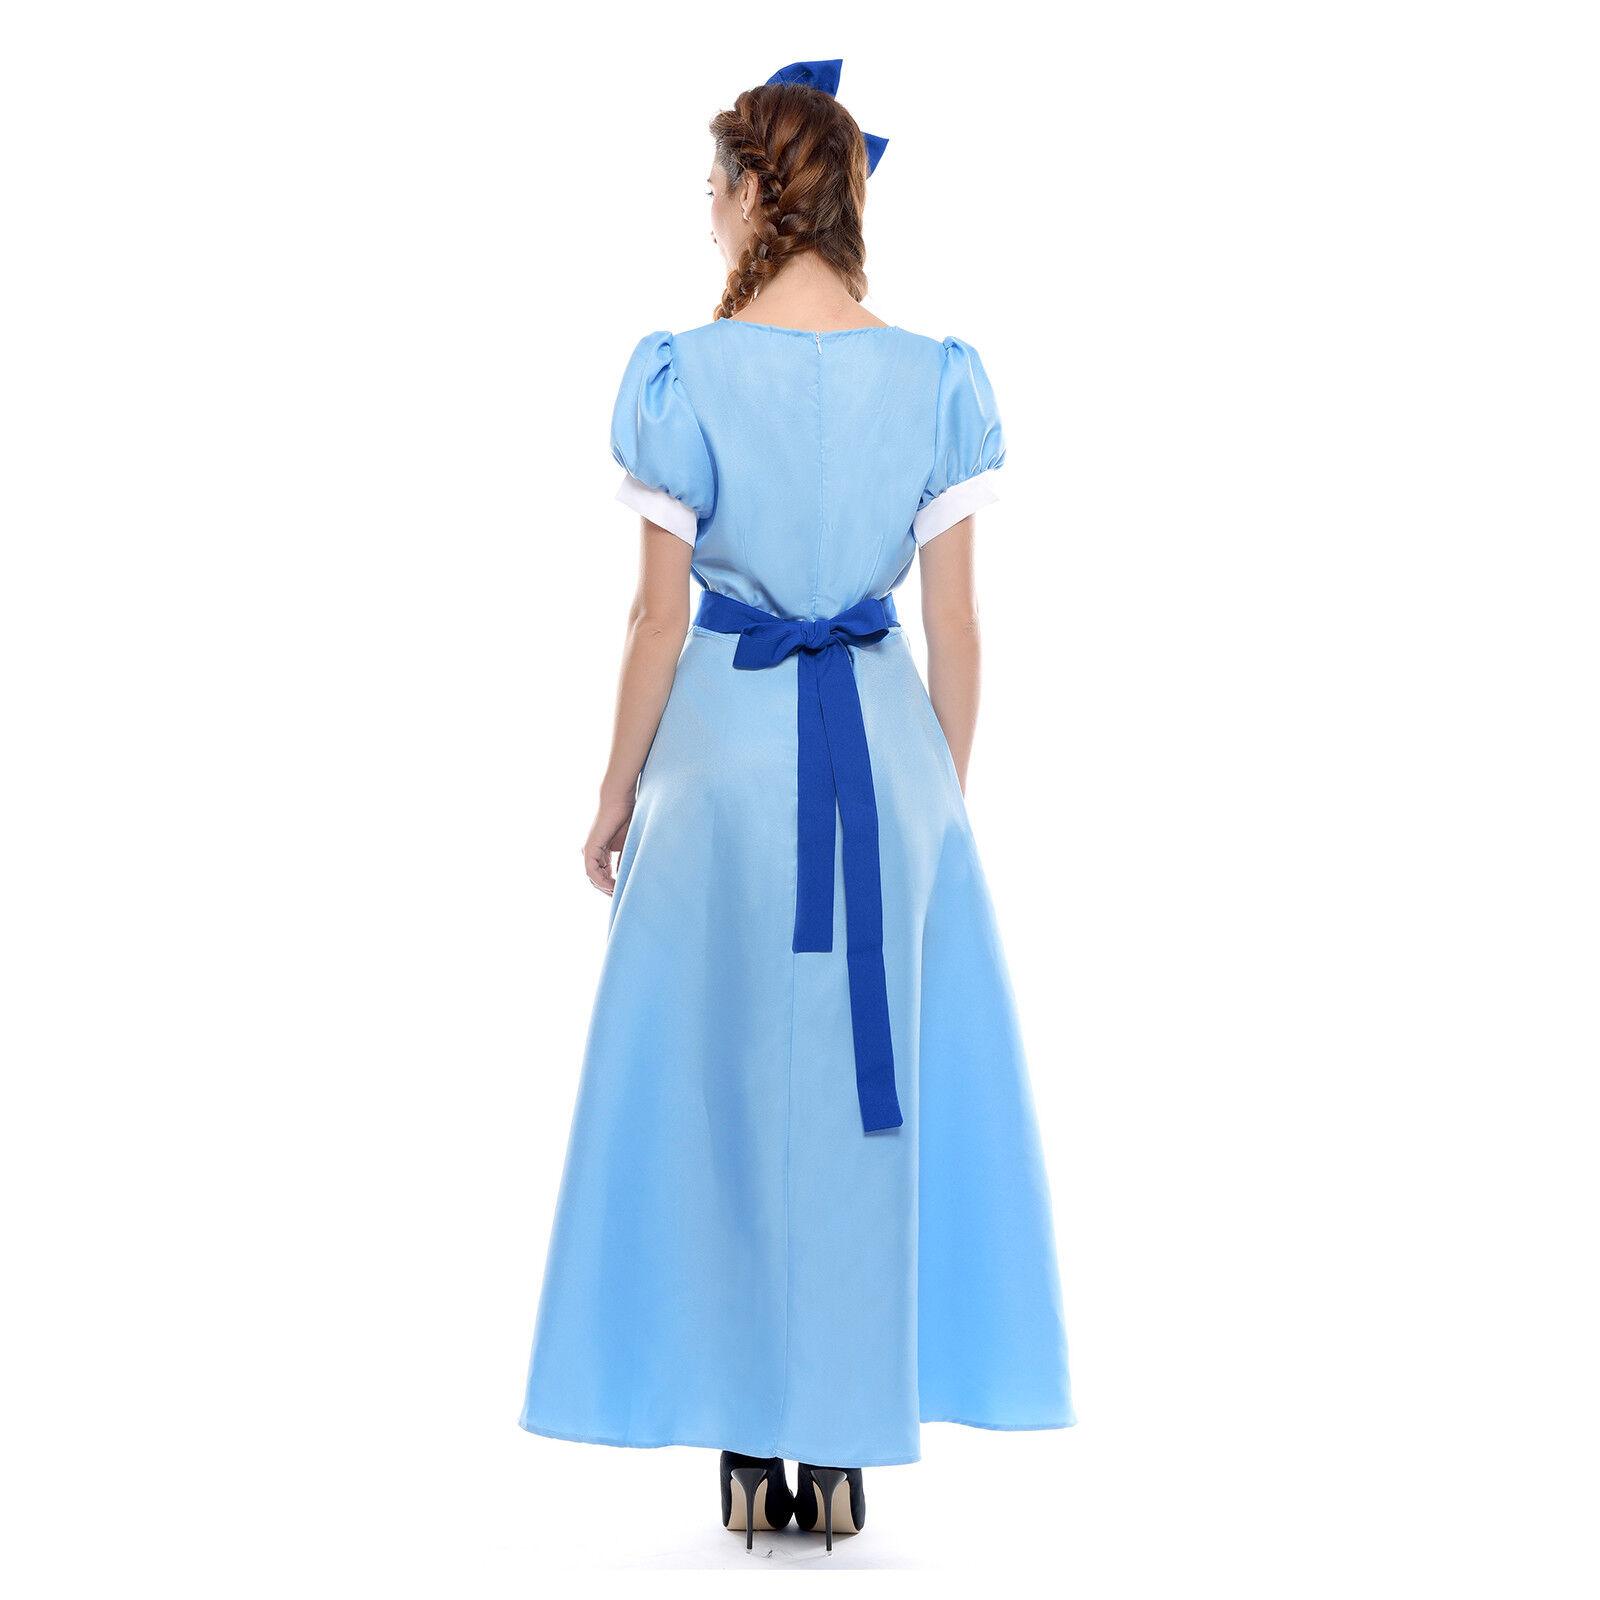 Custom Boutique Halloween Peter Pan WENDY Darling Blue Costume Girls Dress